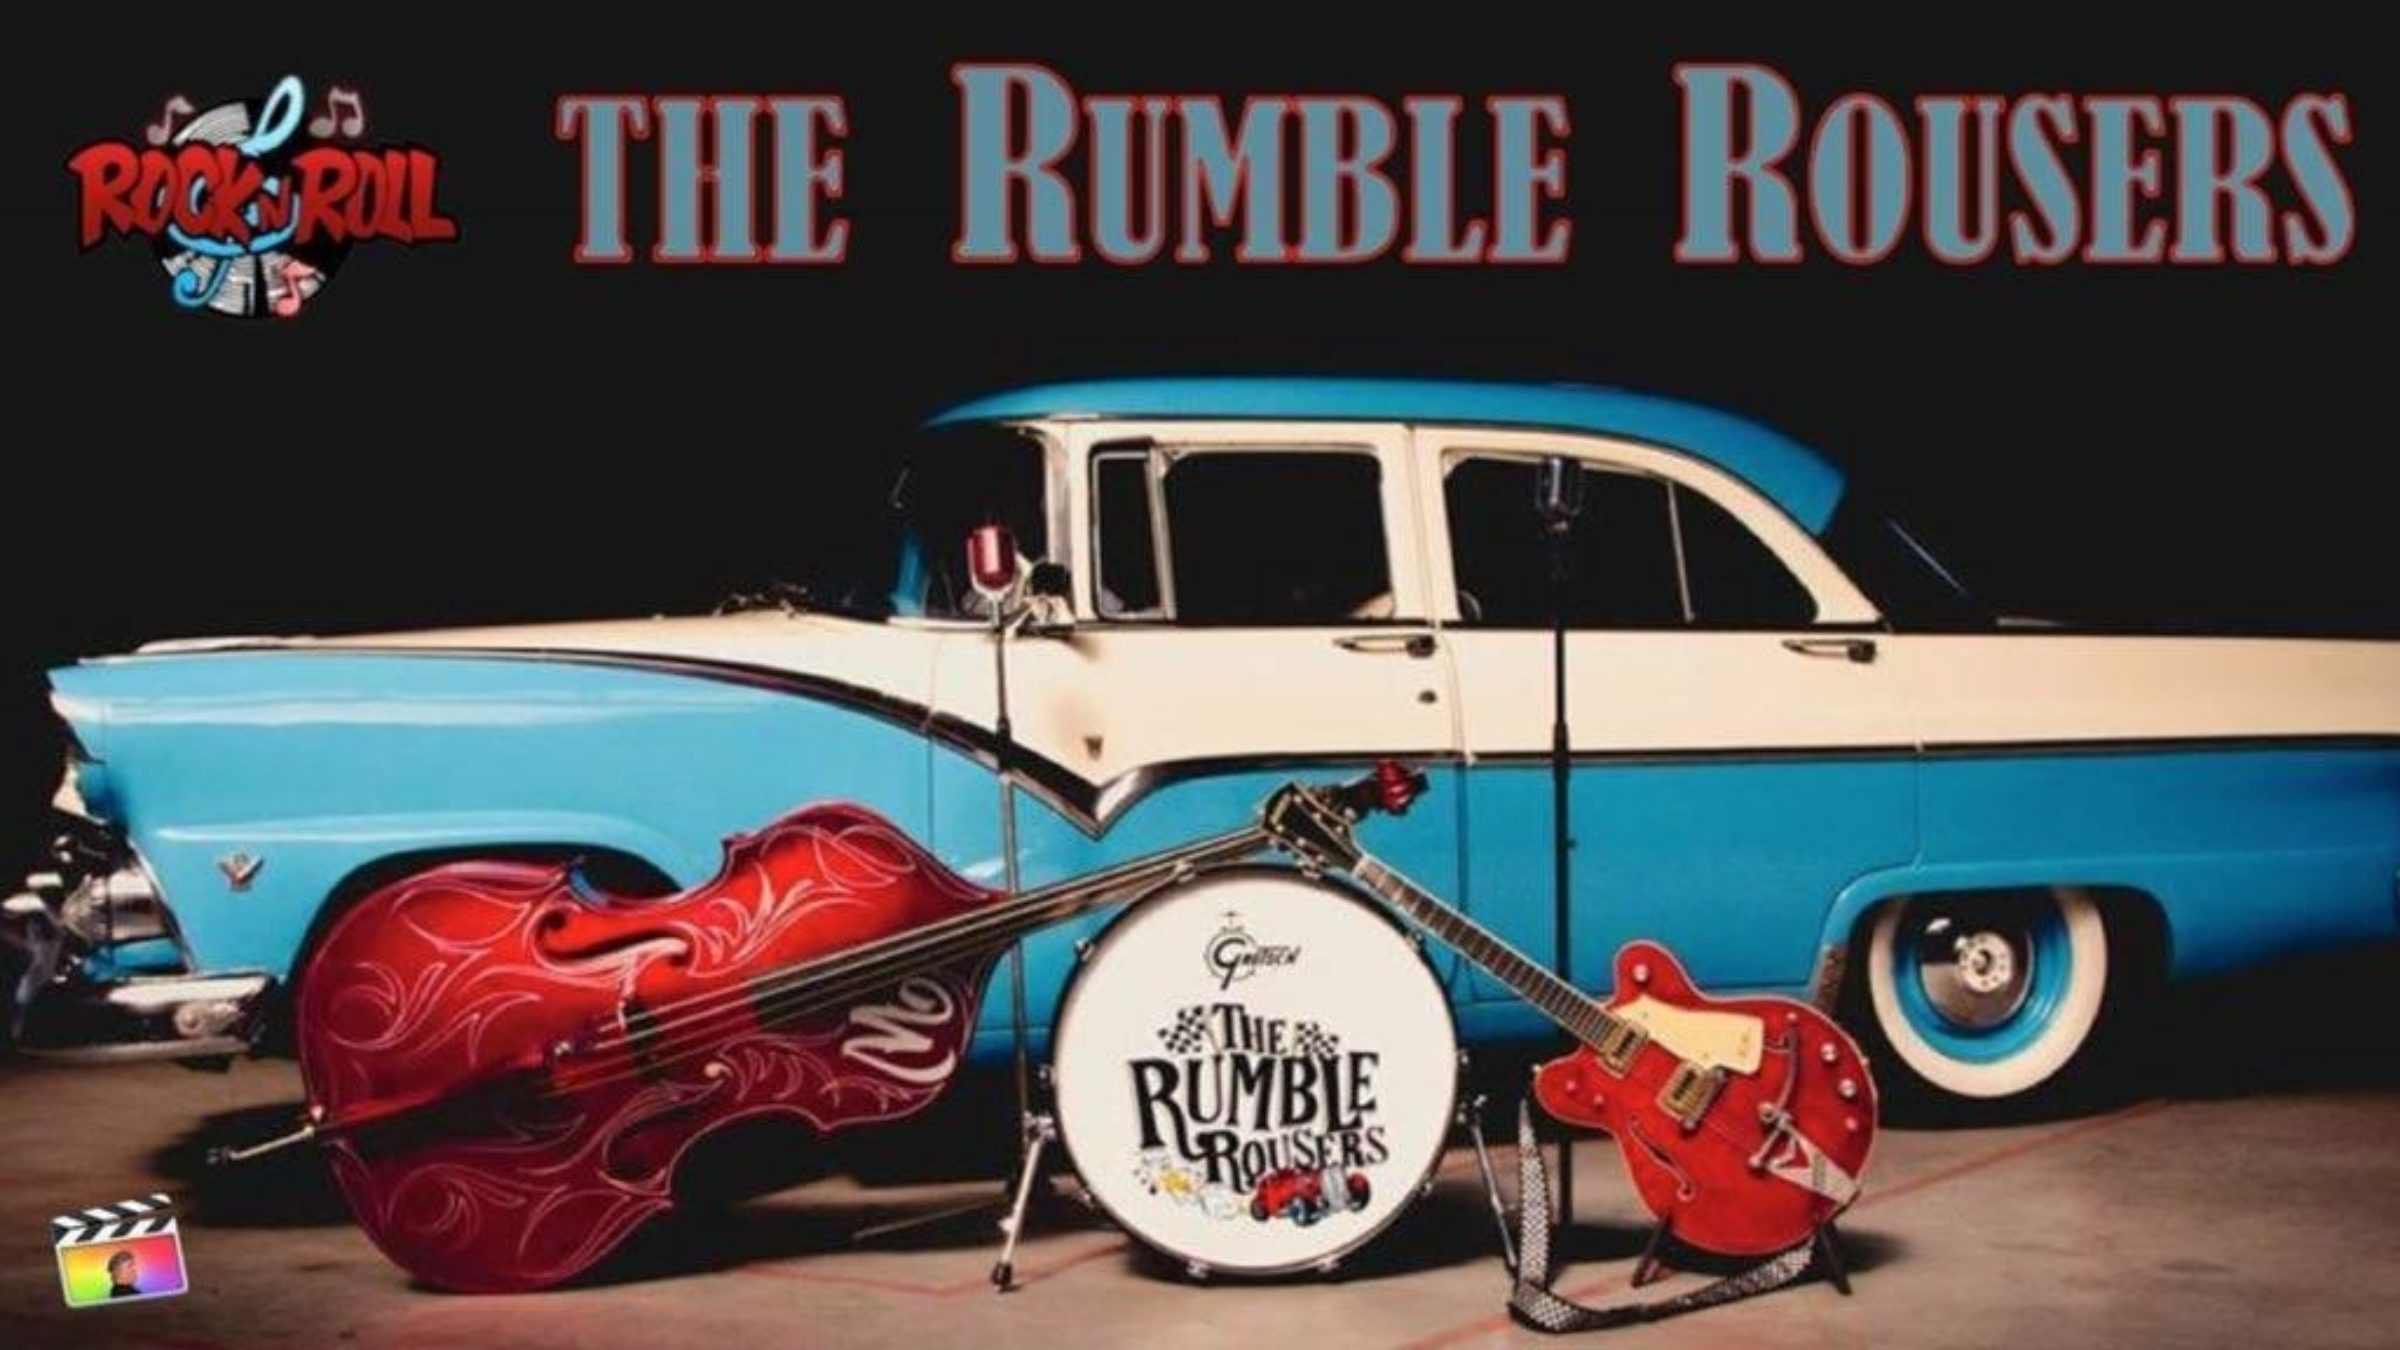 The rumble rousers 2476 1553244278 35hxeipeug